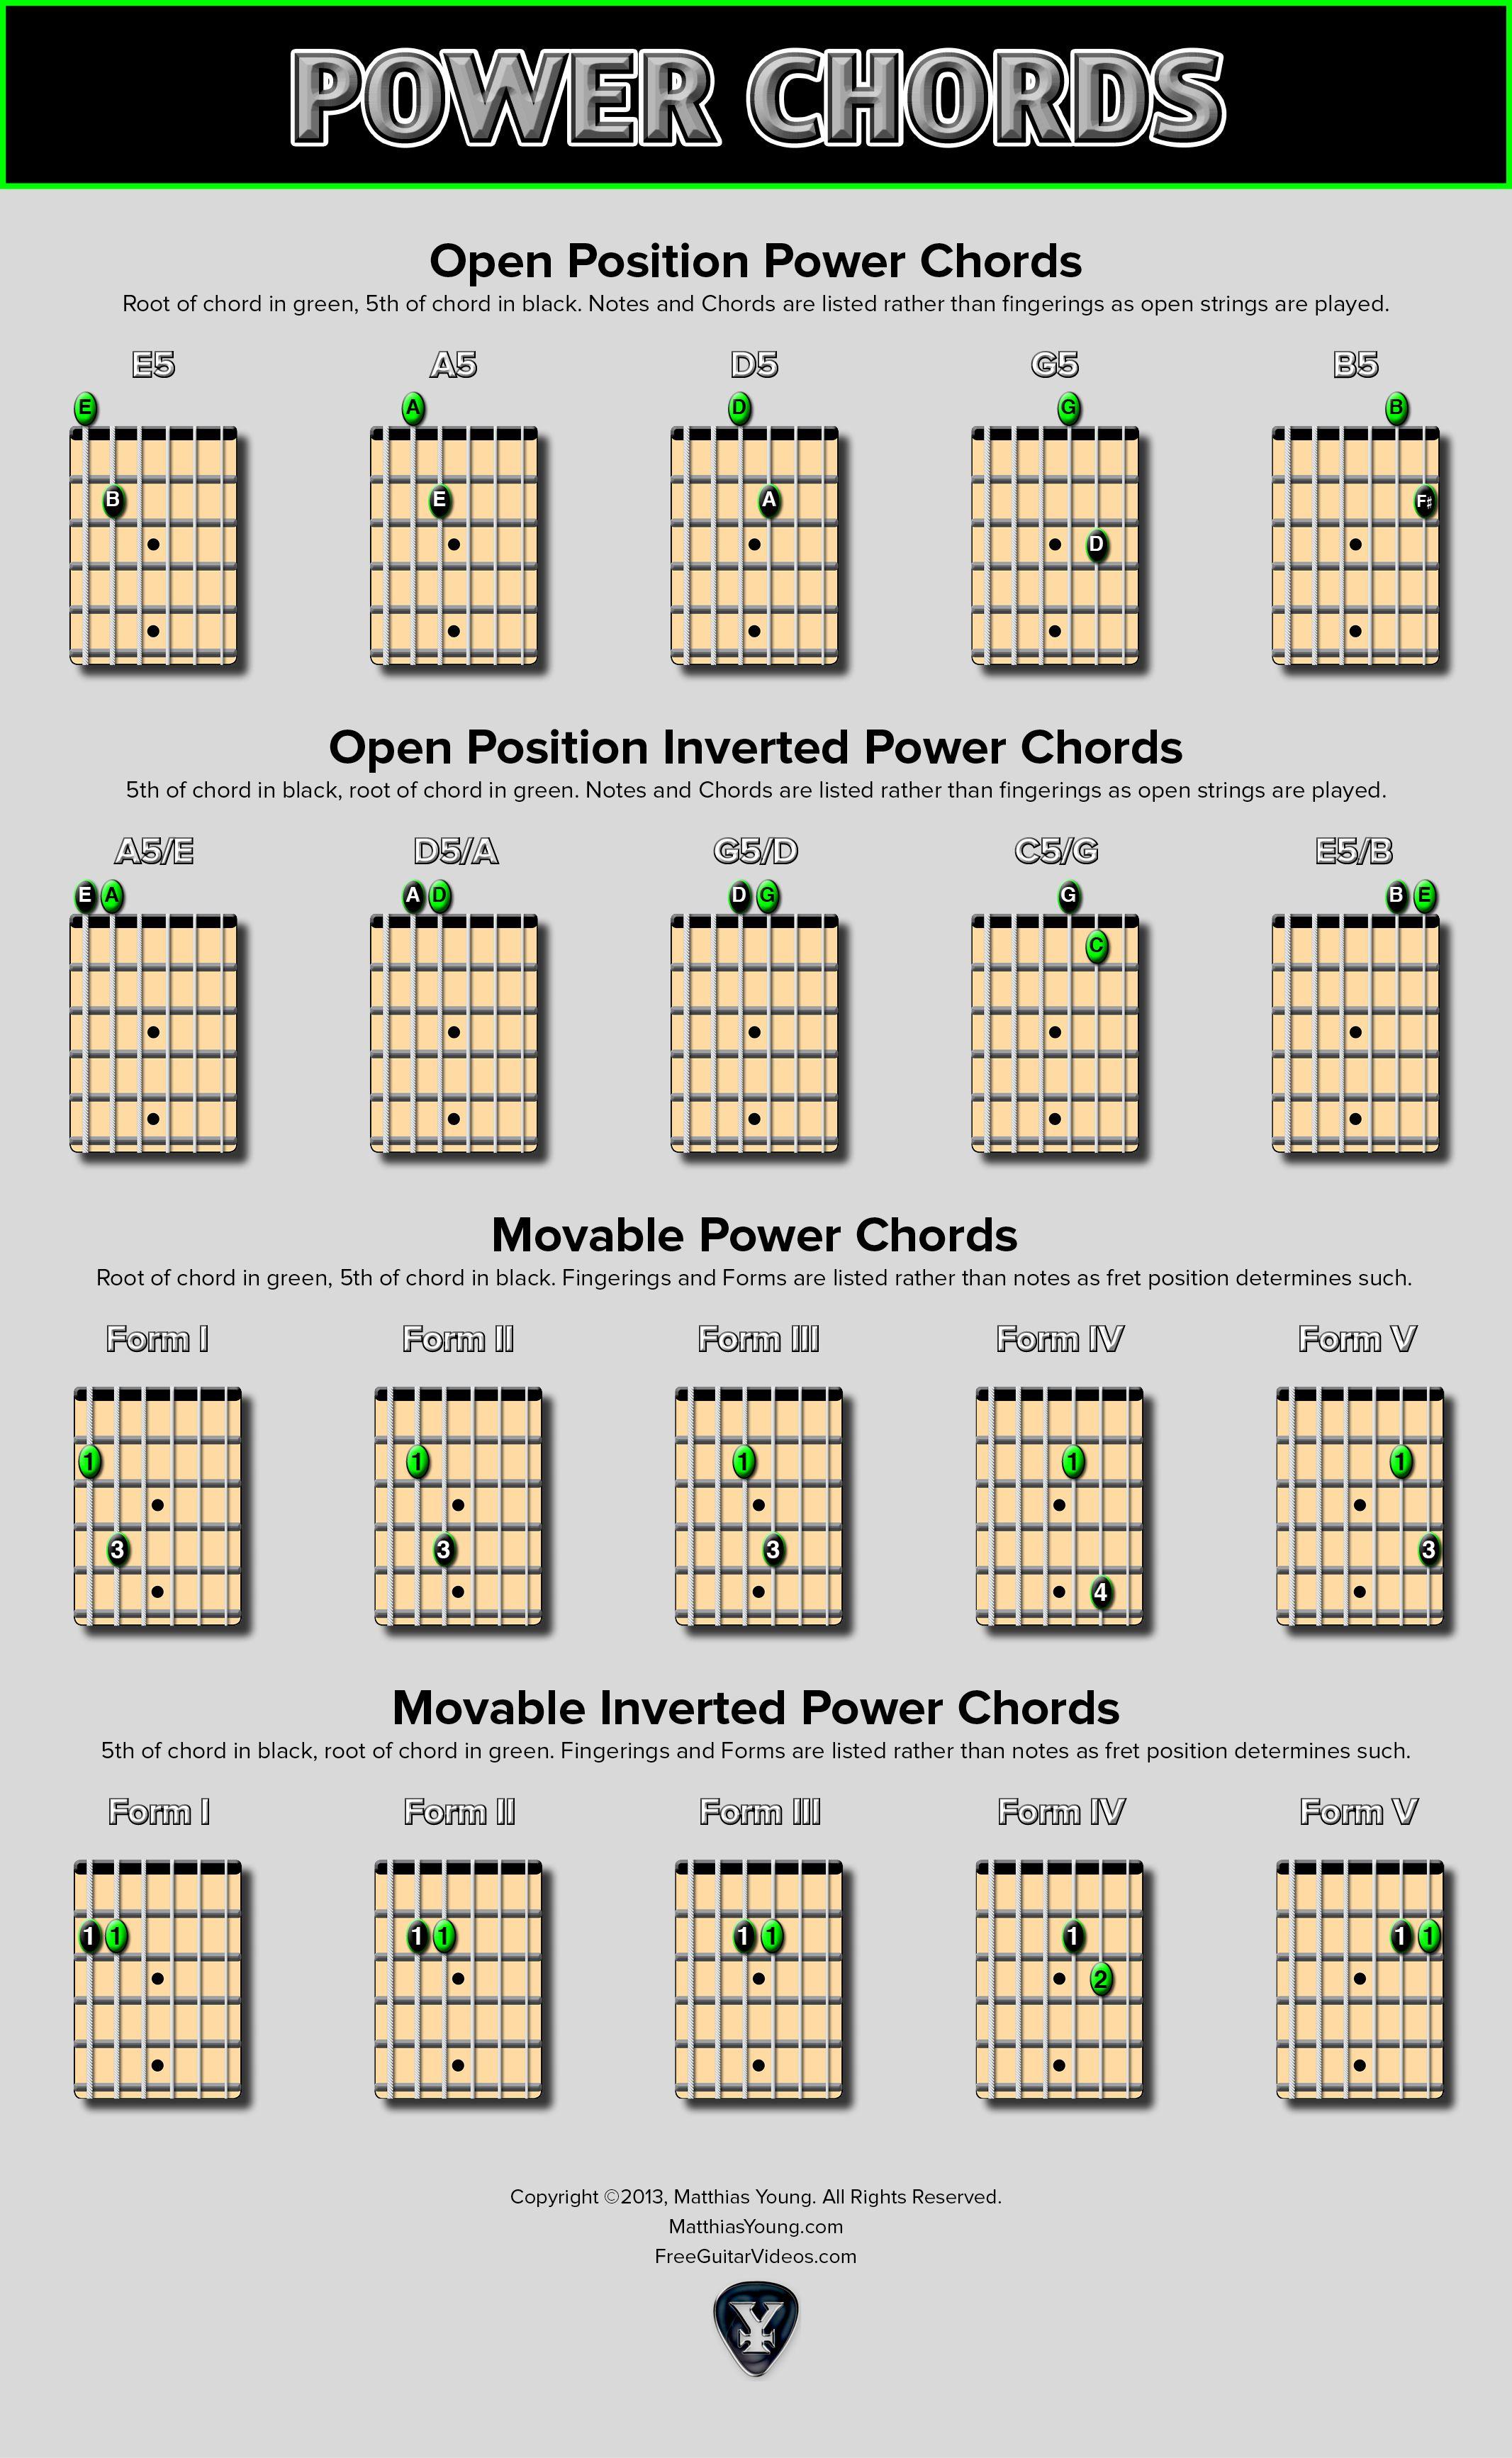 Power chords the guitar according to matthias guitar stuff power chords the guitar according to matthias hexwebz Images